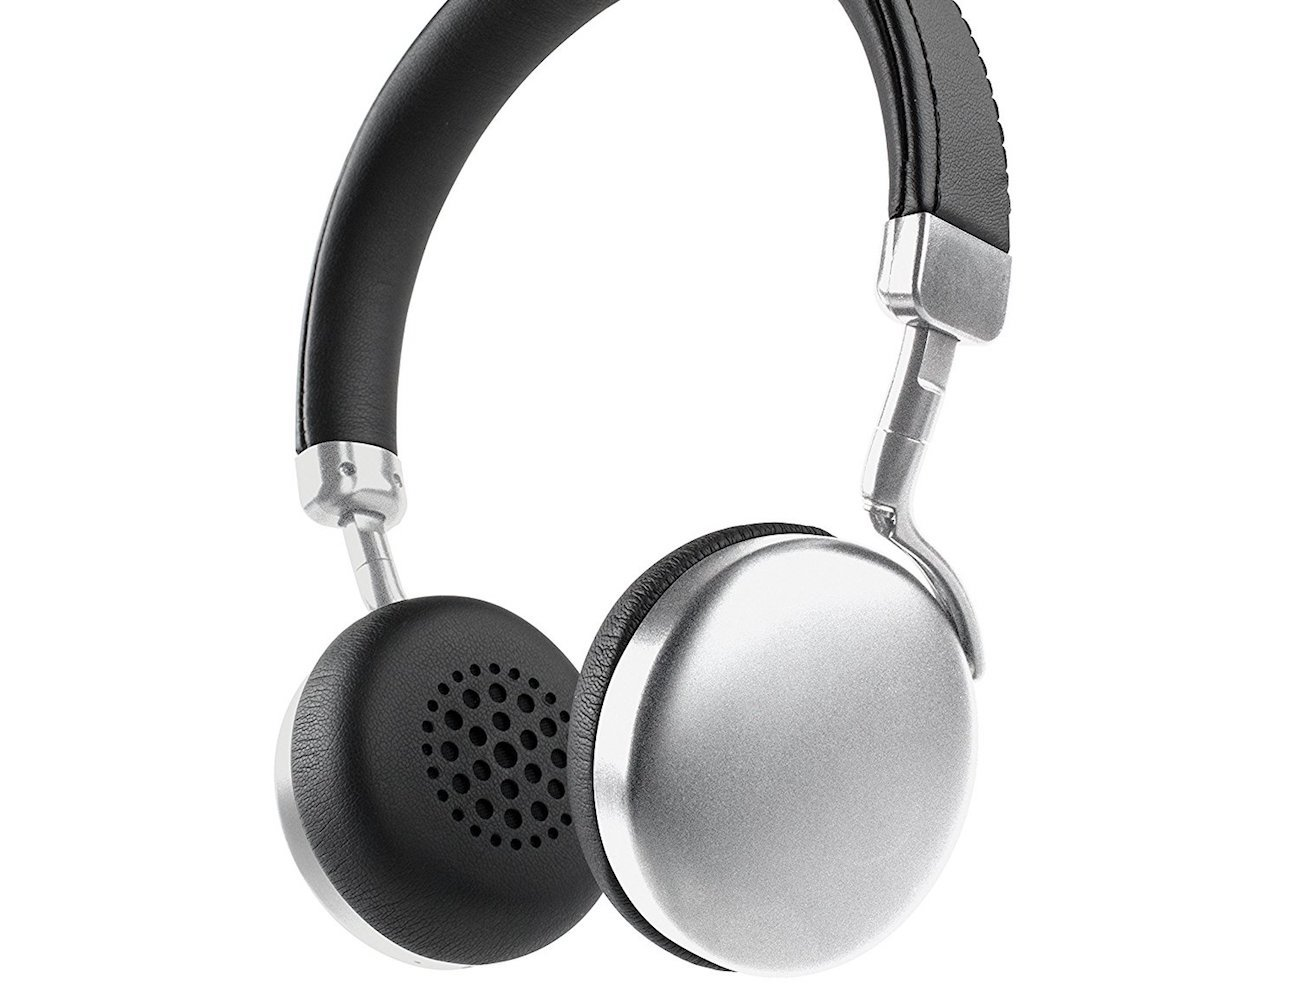 Photive HF1 Lightweight Wireless Headphones